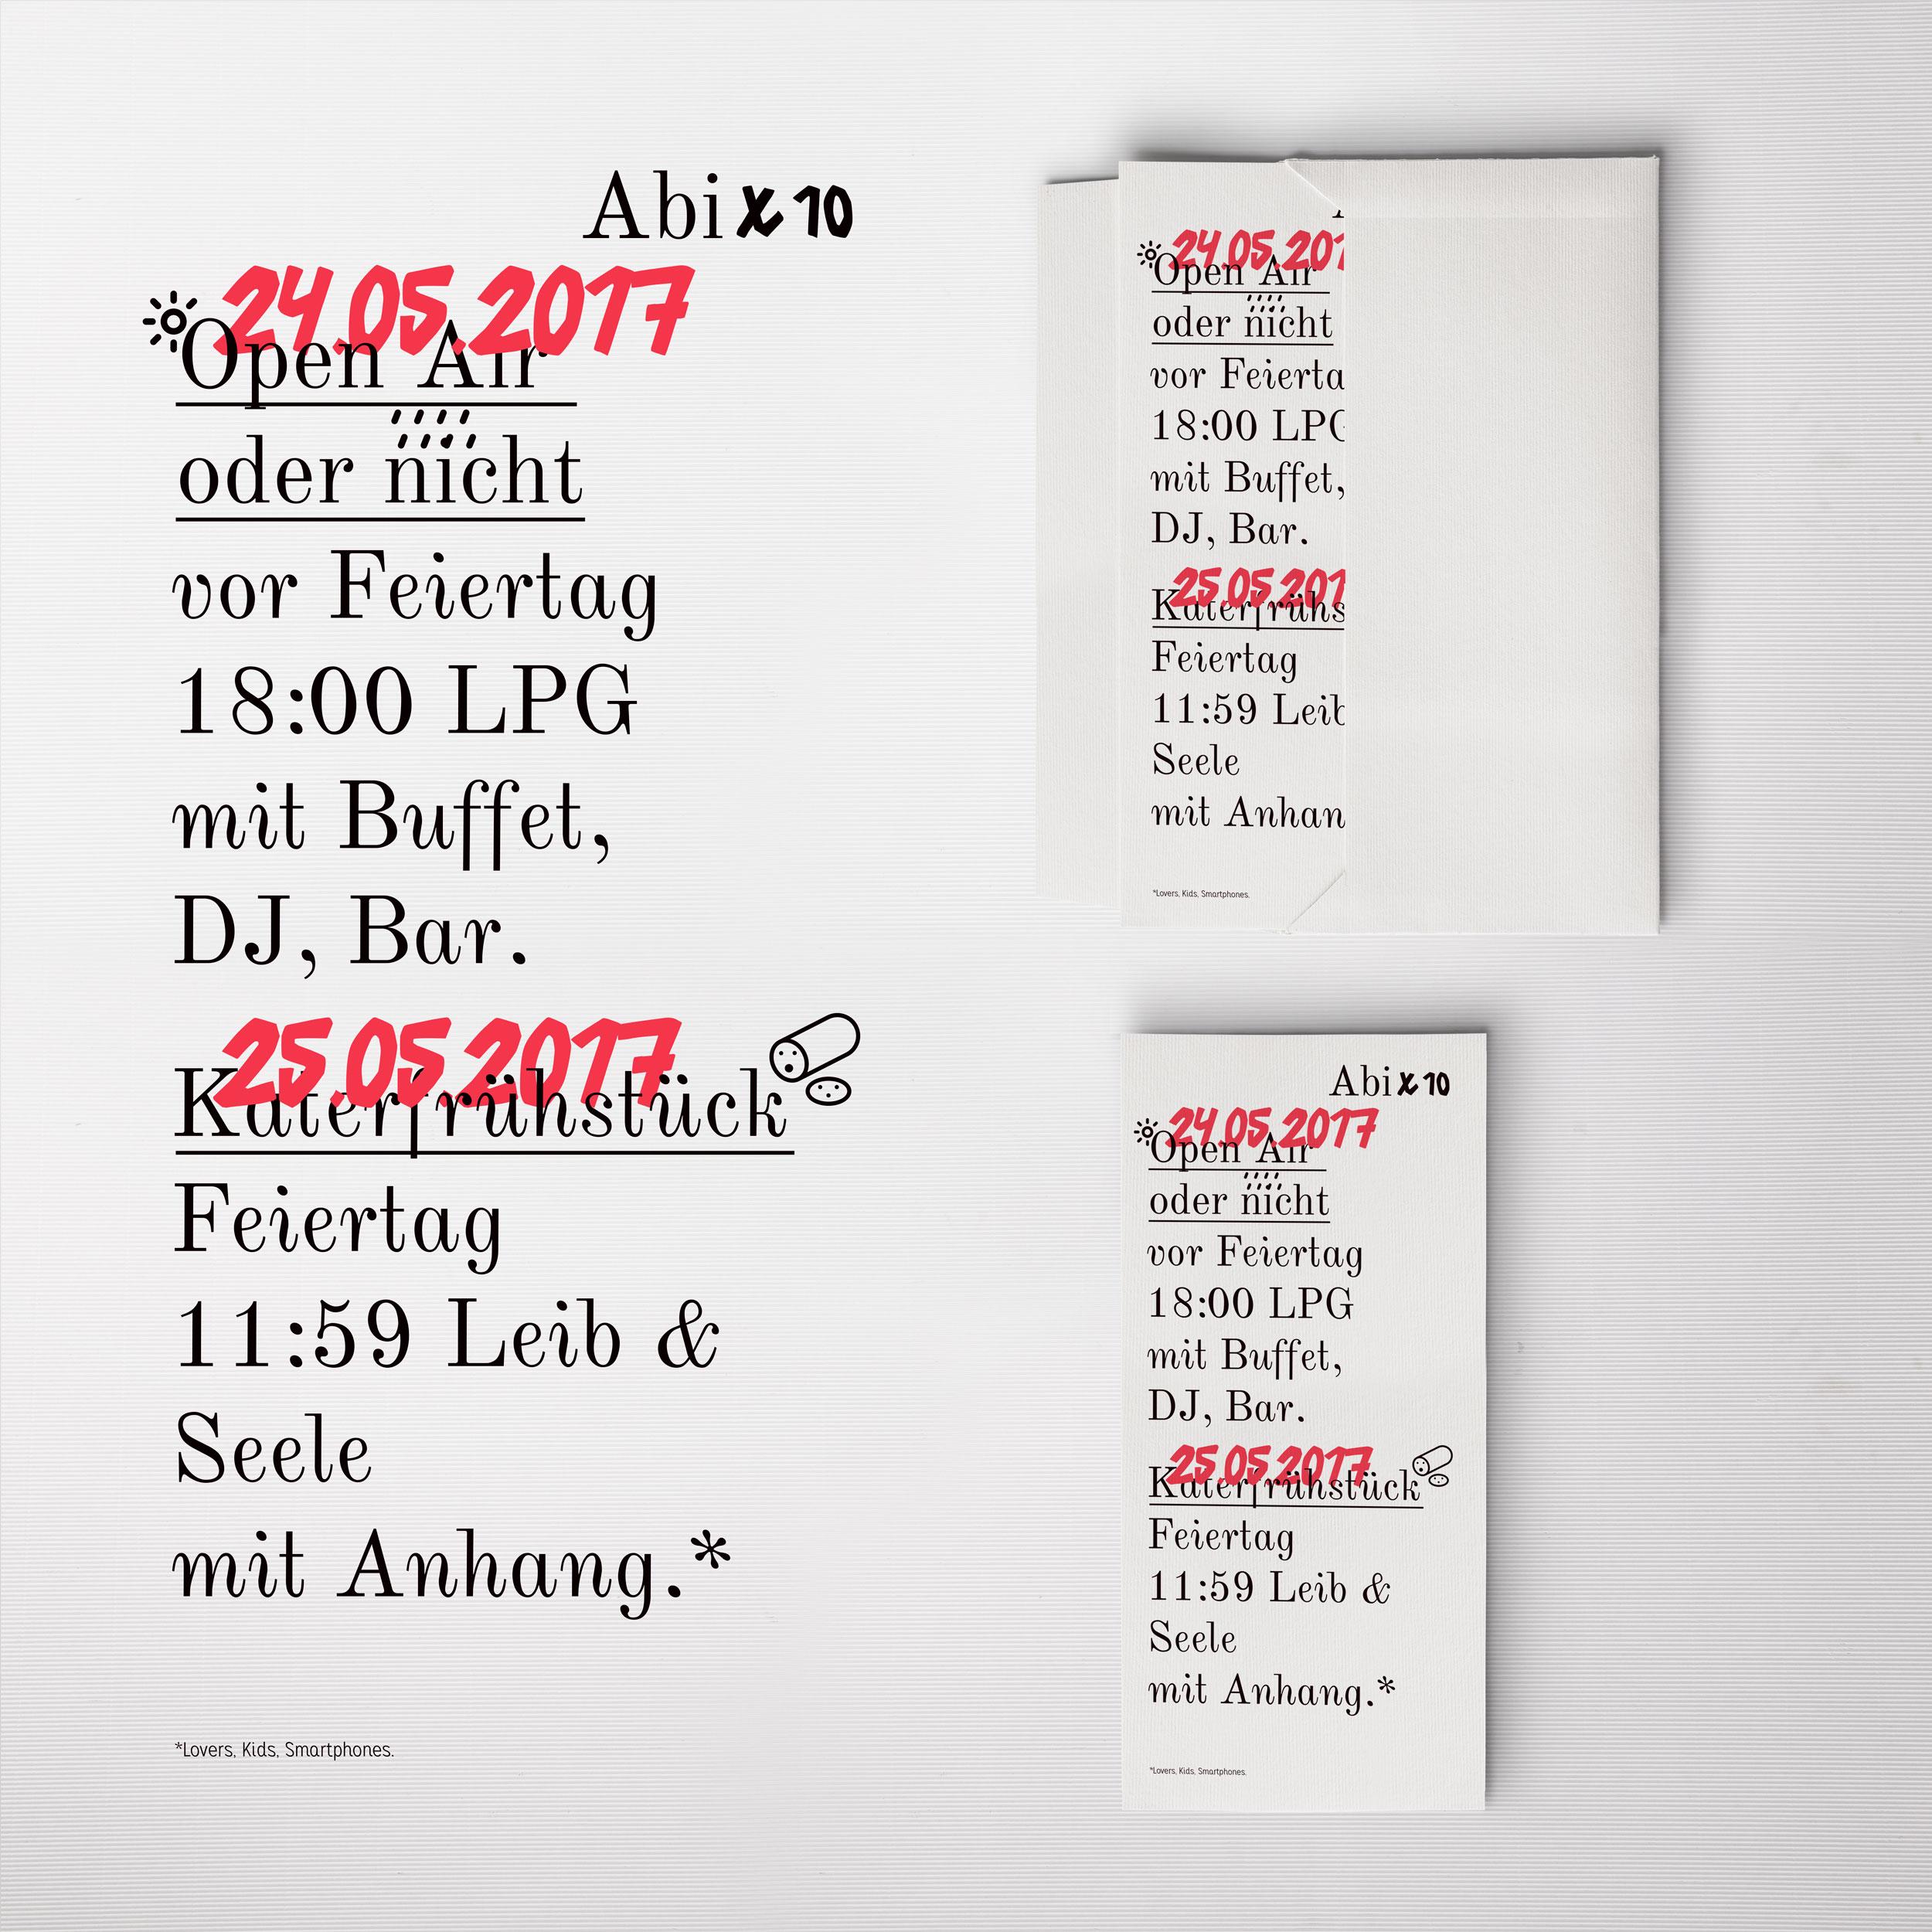 Abix10 Flyer designed by Tobias Heumann